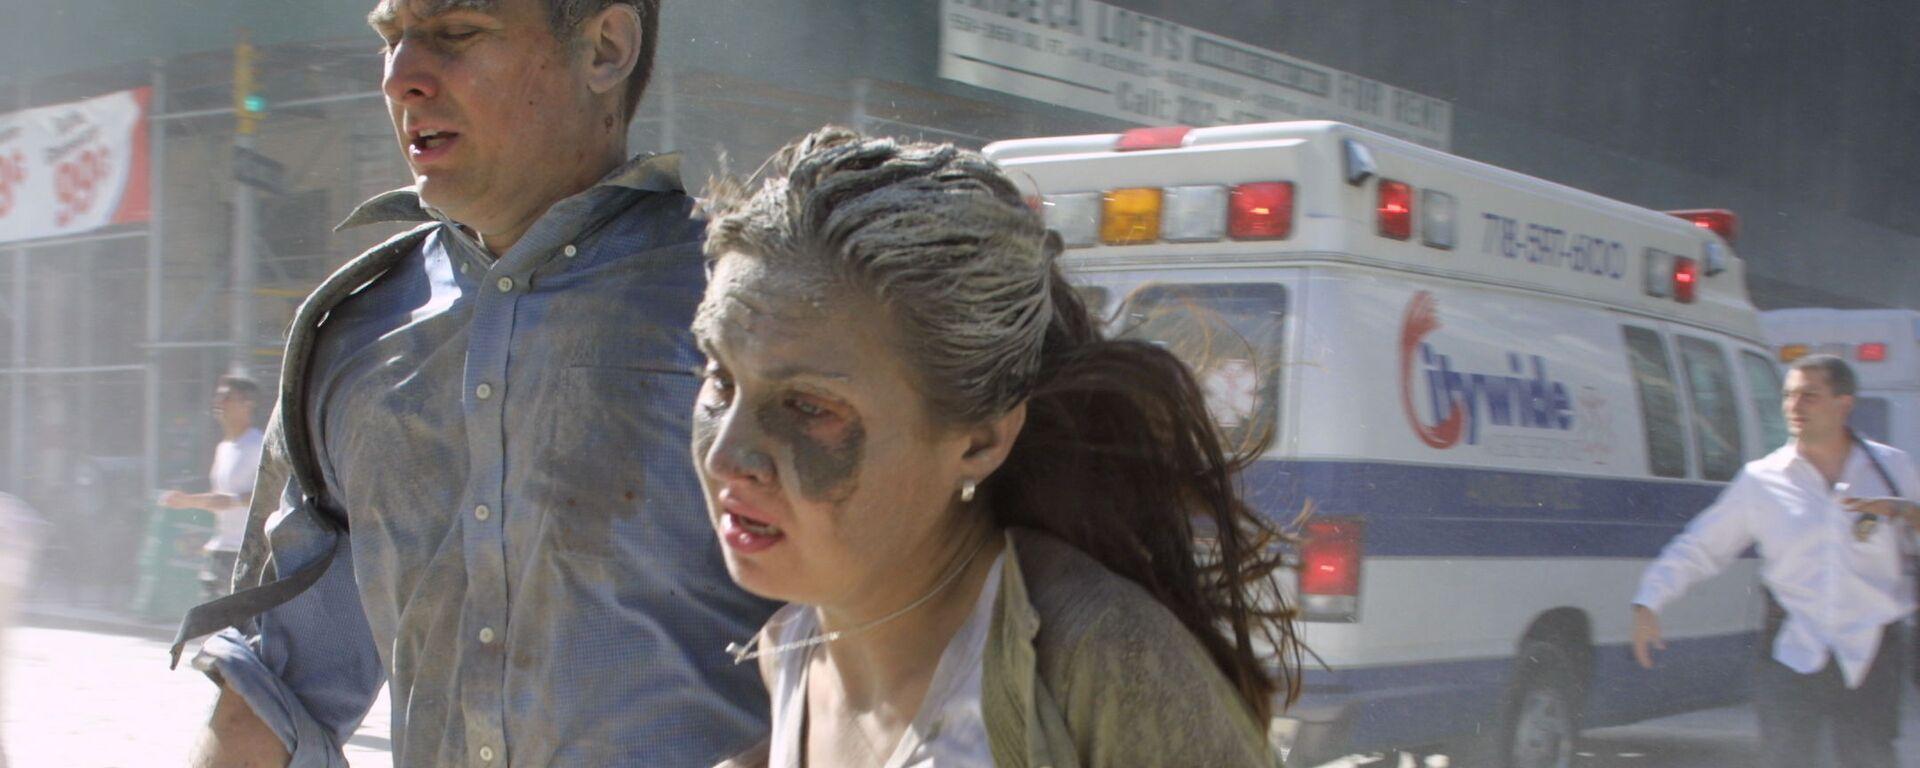 Terroranschläge am 11. September 2001 - SNA, 1920, 11.09.2021